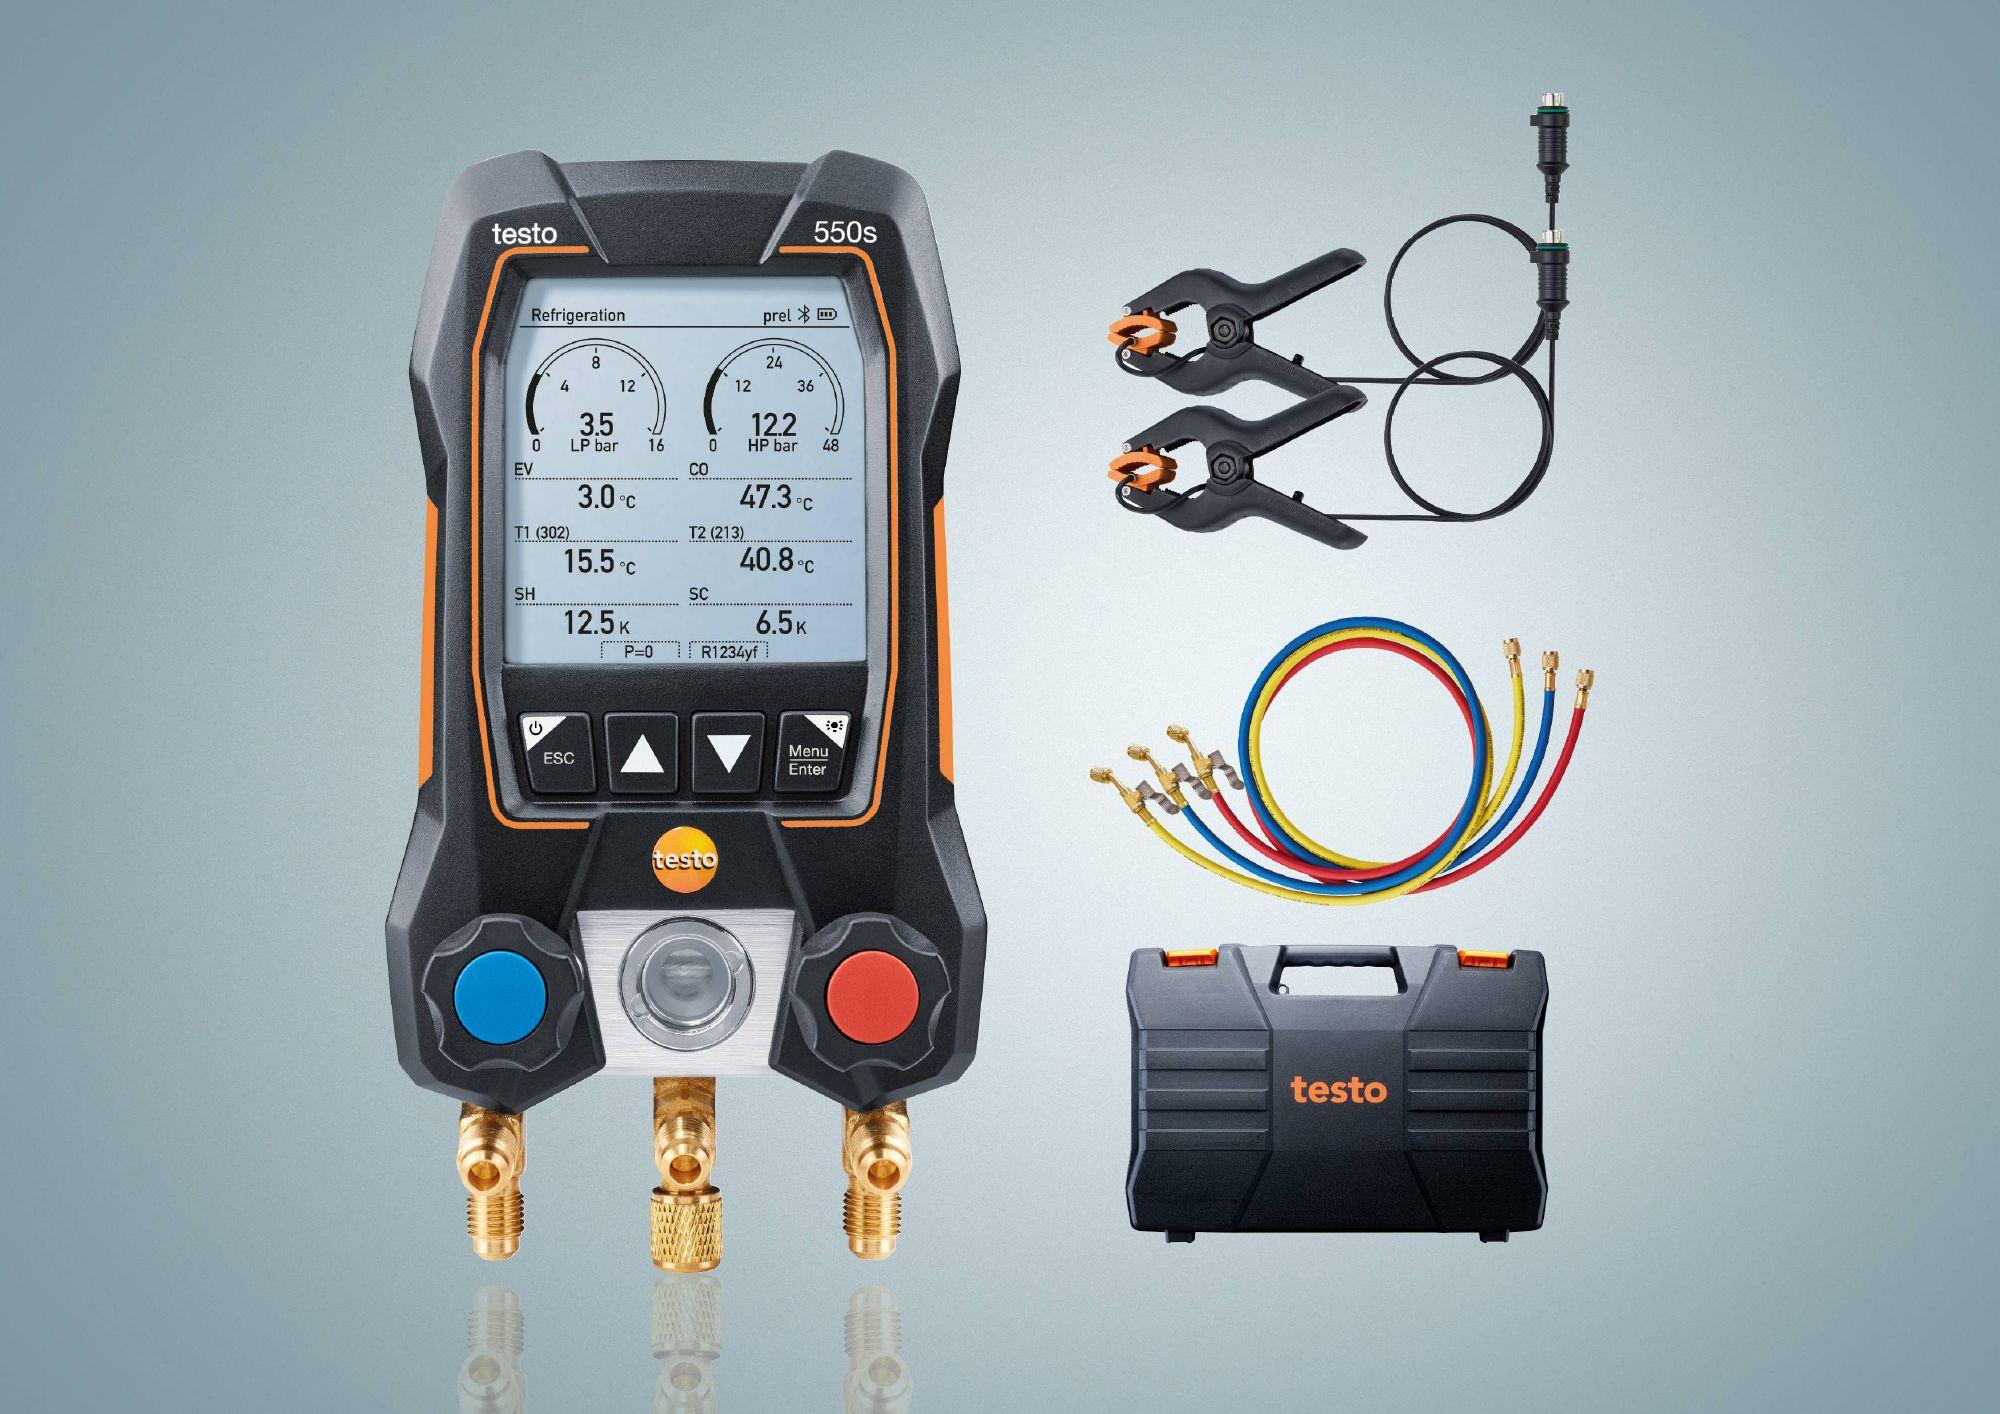 testo 550s Basic Set